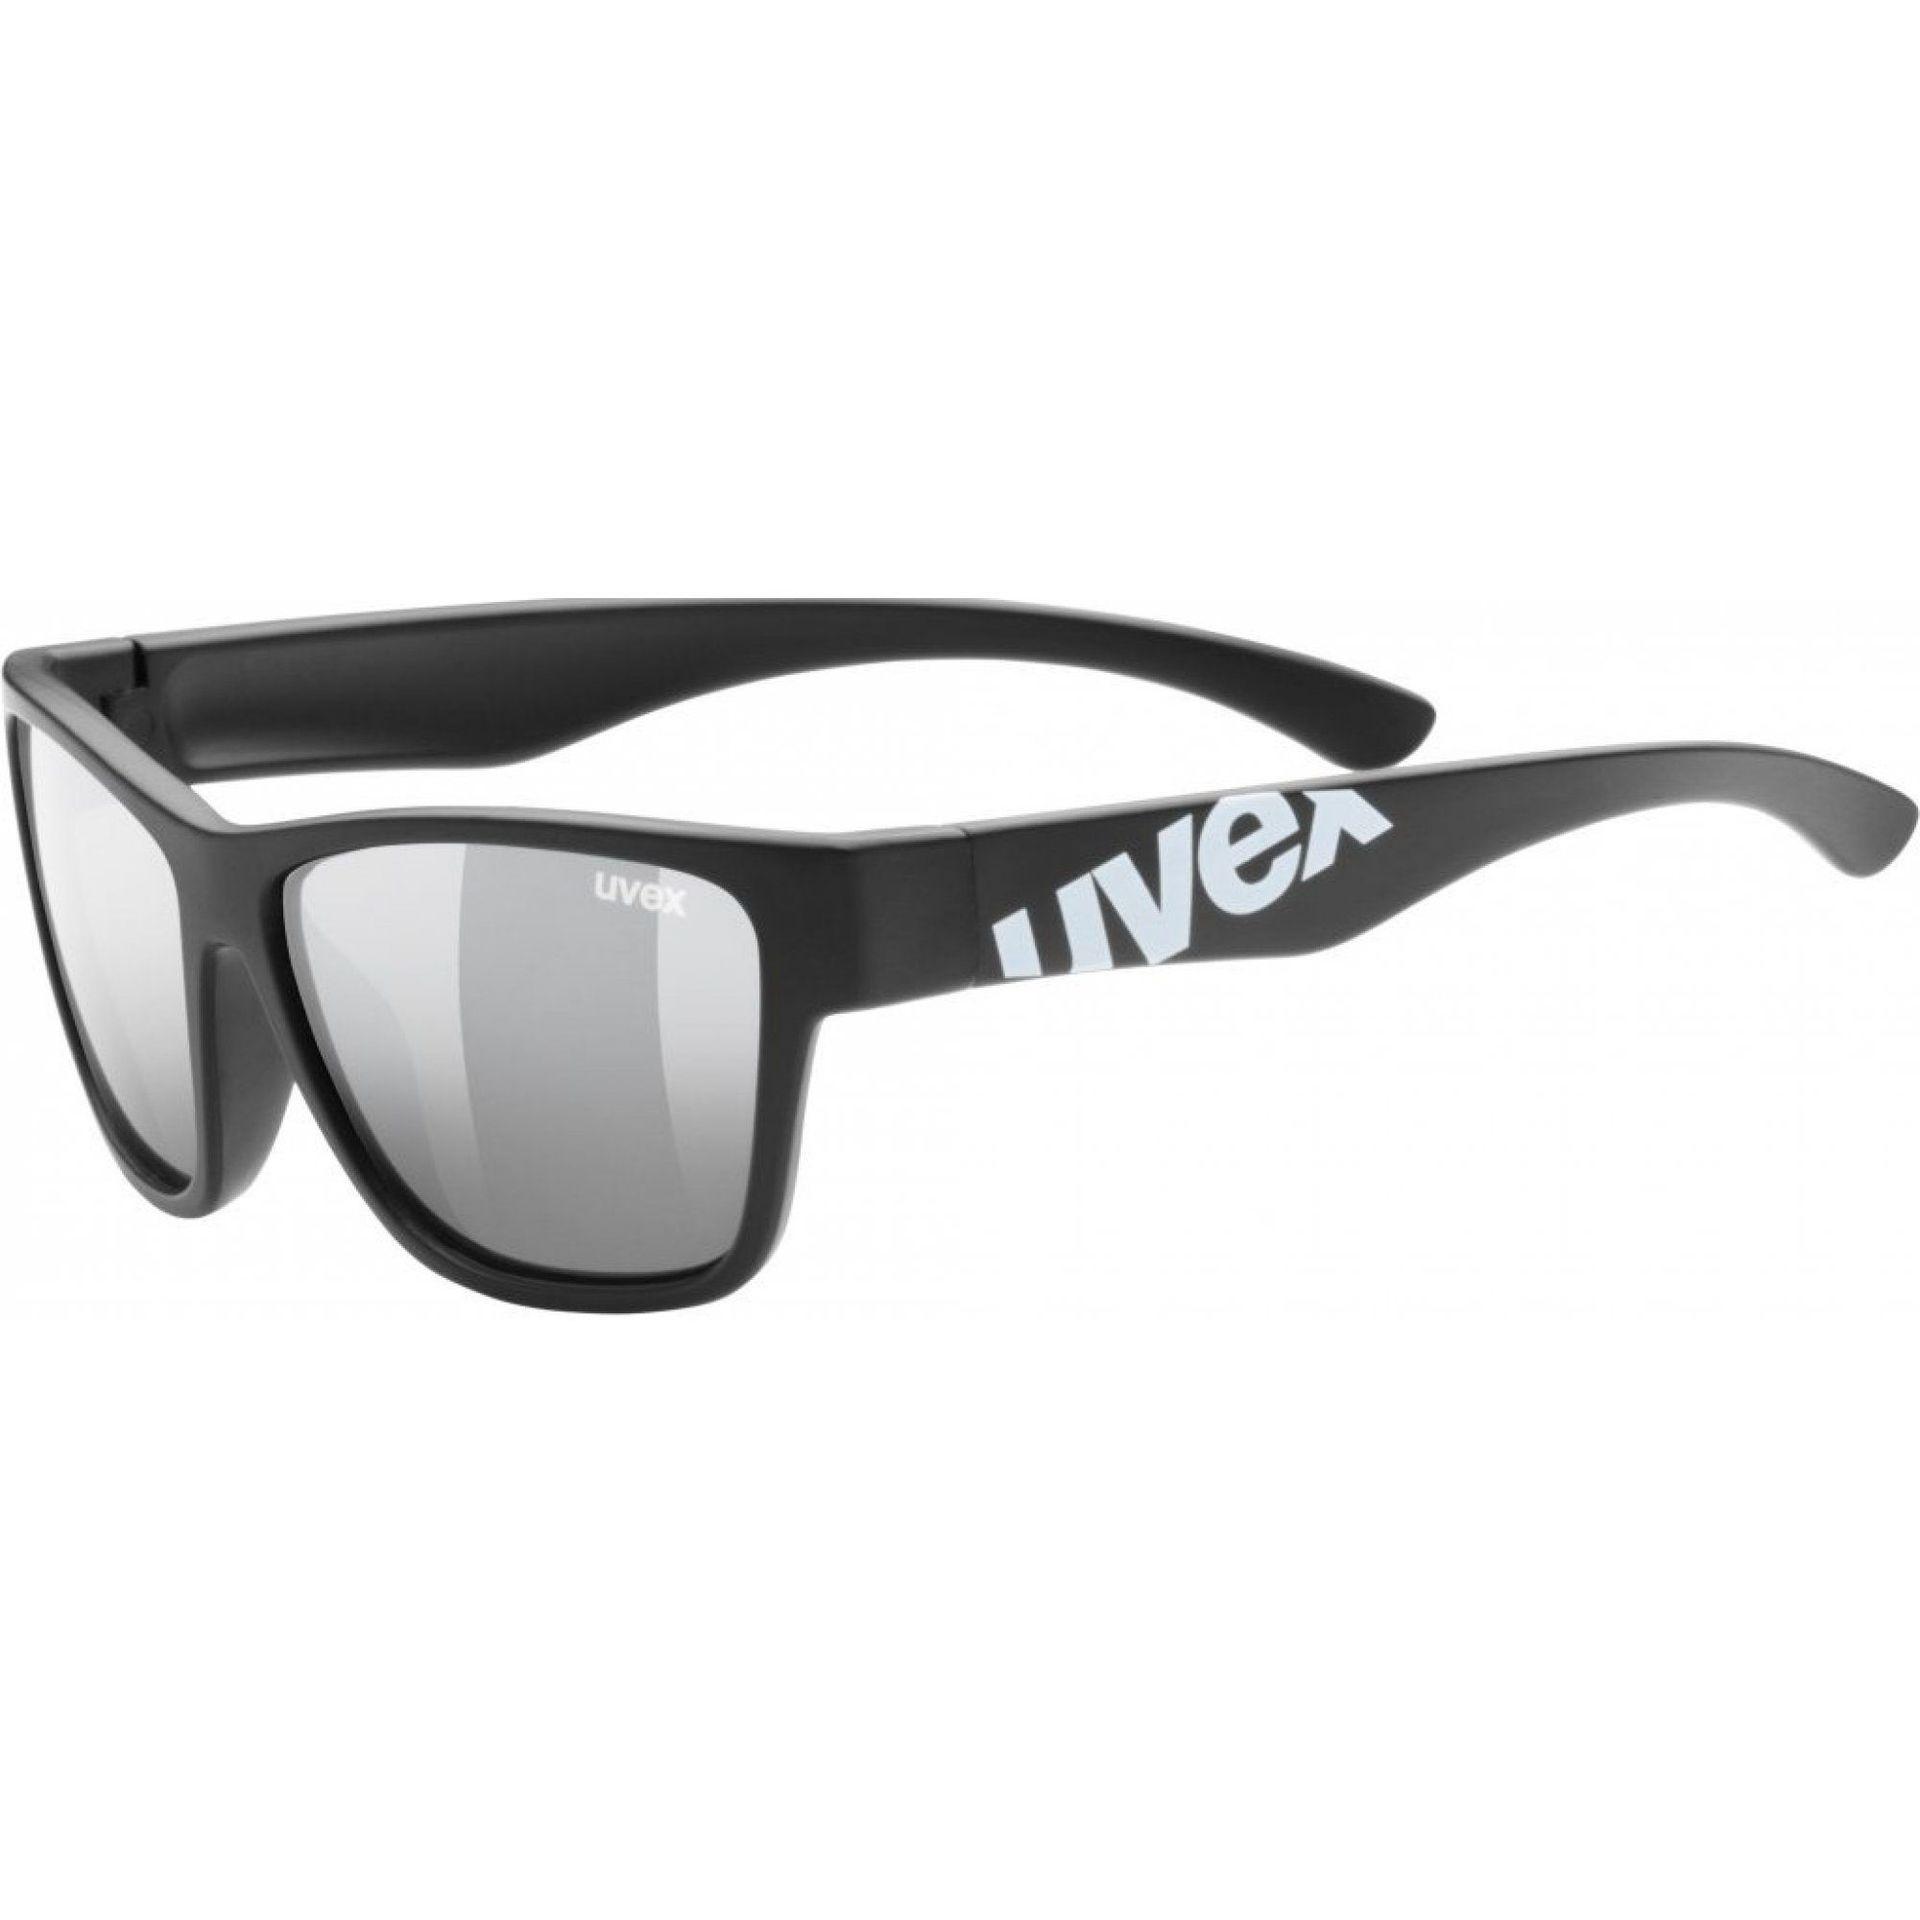 OKULARY UVEX SPORTSTYLE 508 BLACK MAT|SILVER